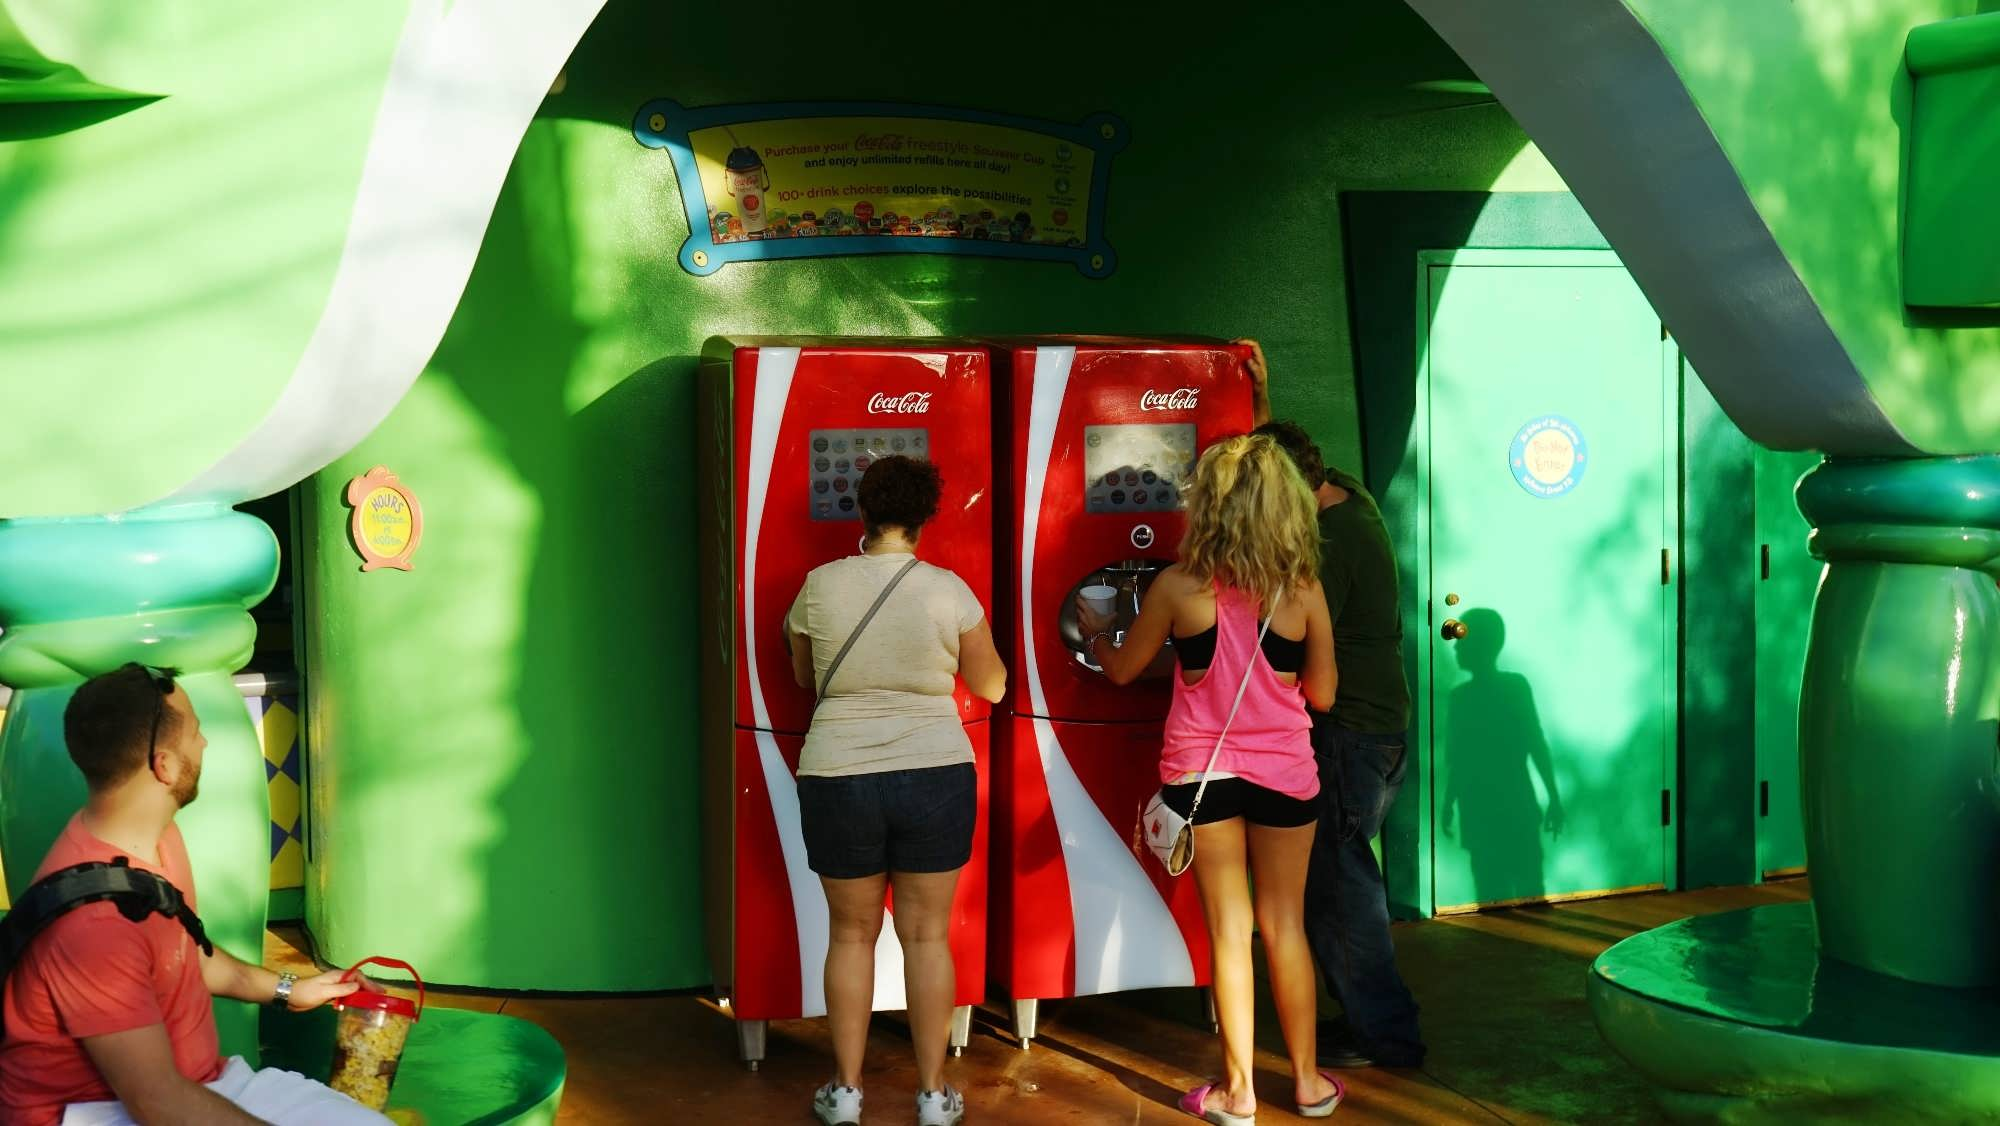 Coke Freestyle station at IOA's Seuss Landing